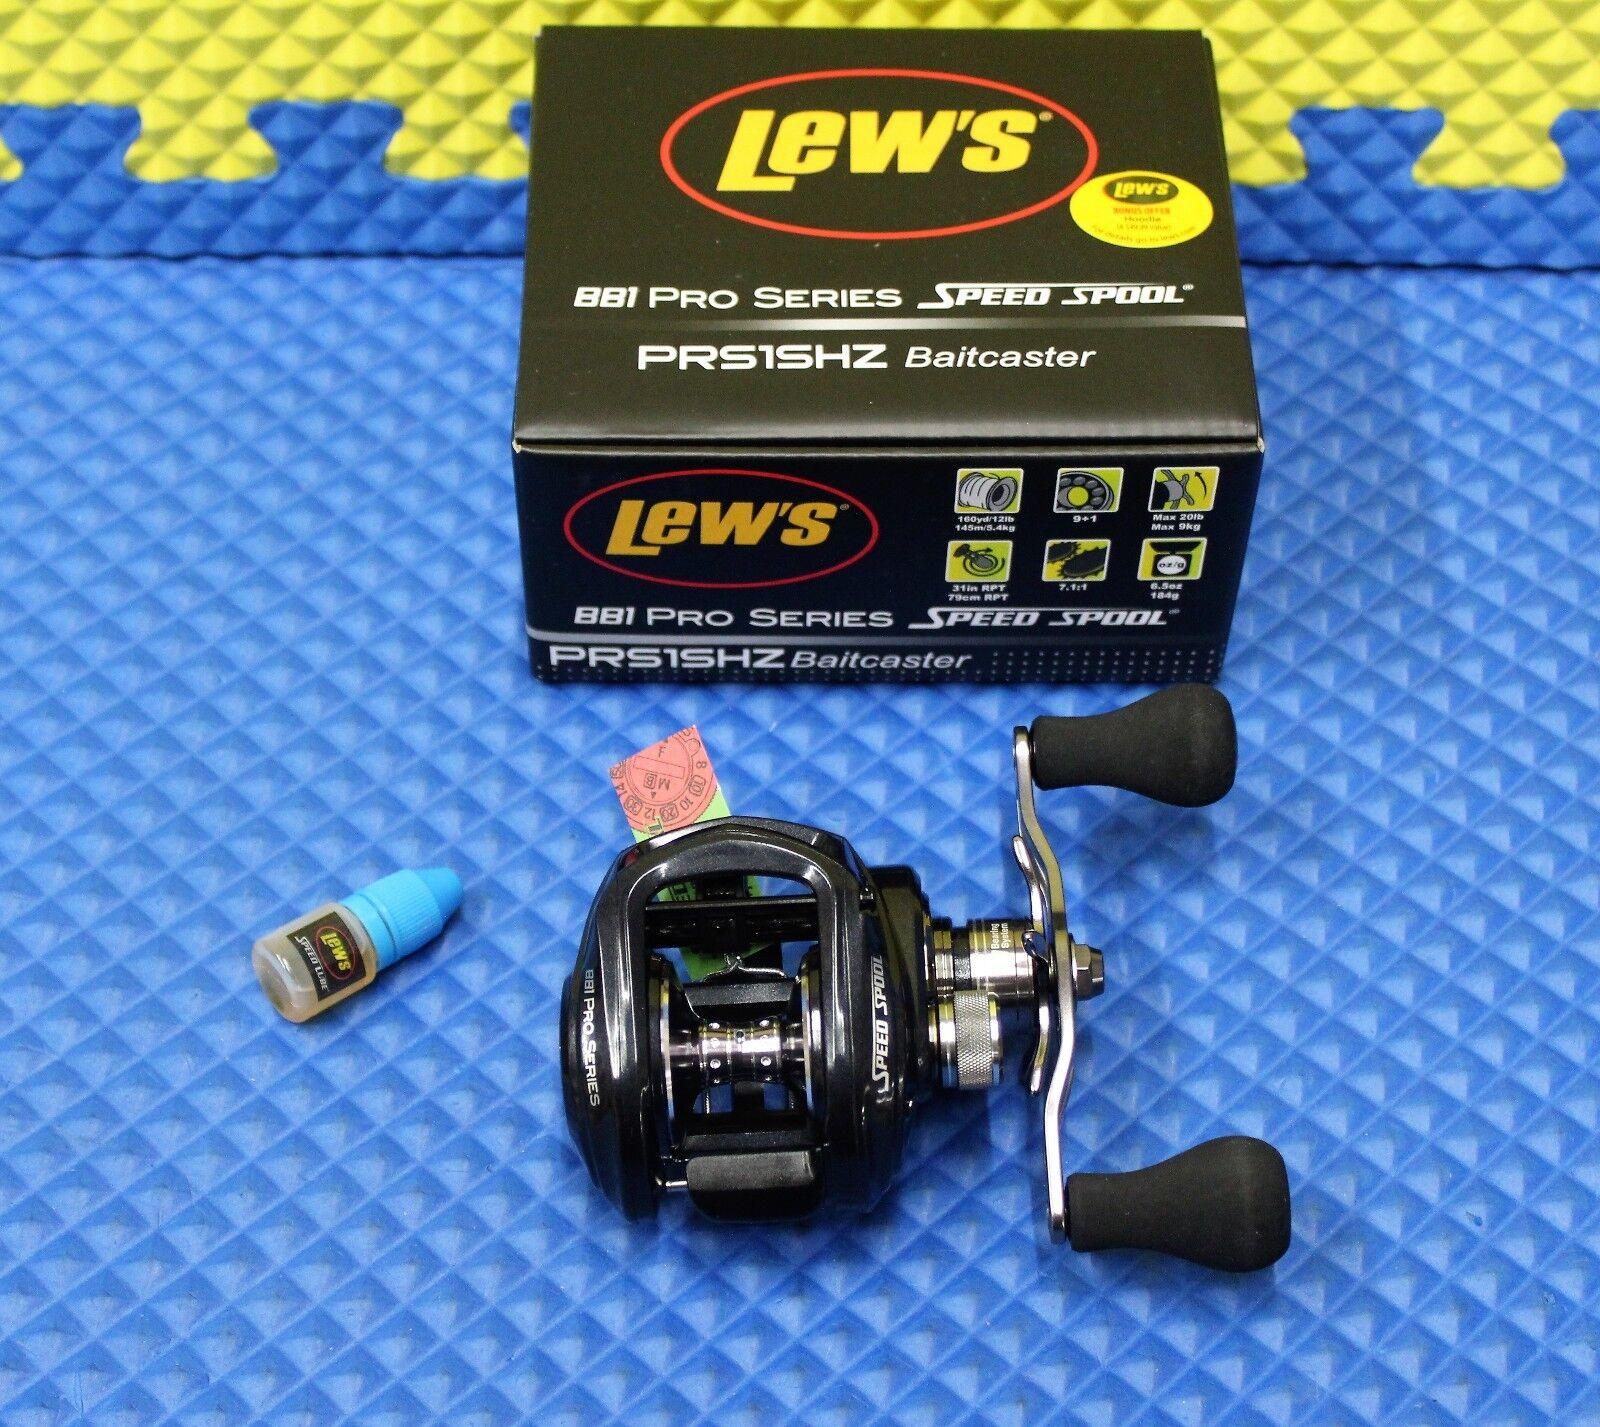 Lew's BB1 Pro Series Speed Spool Baitcaster PRS1SHZ